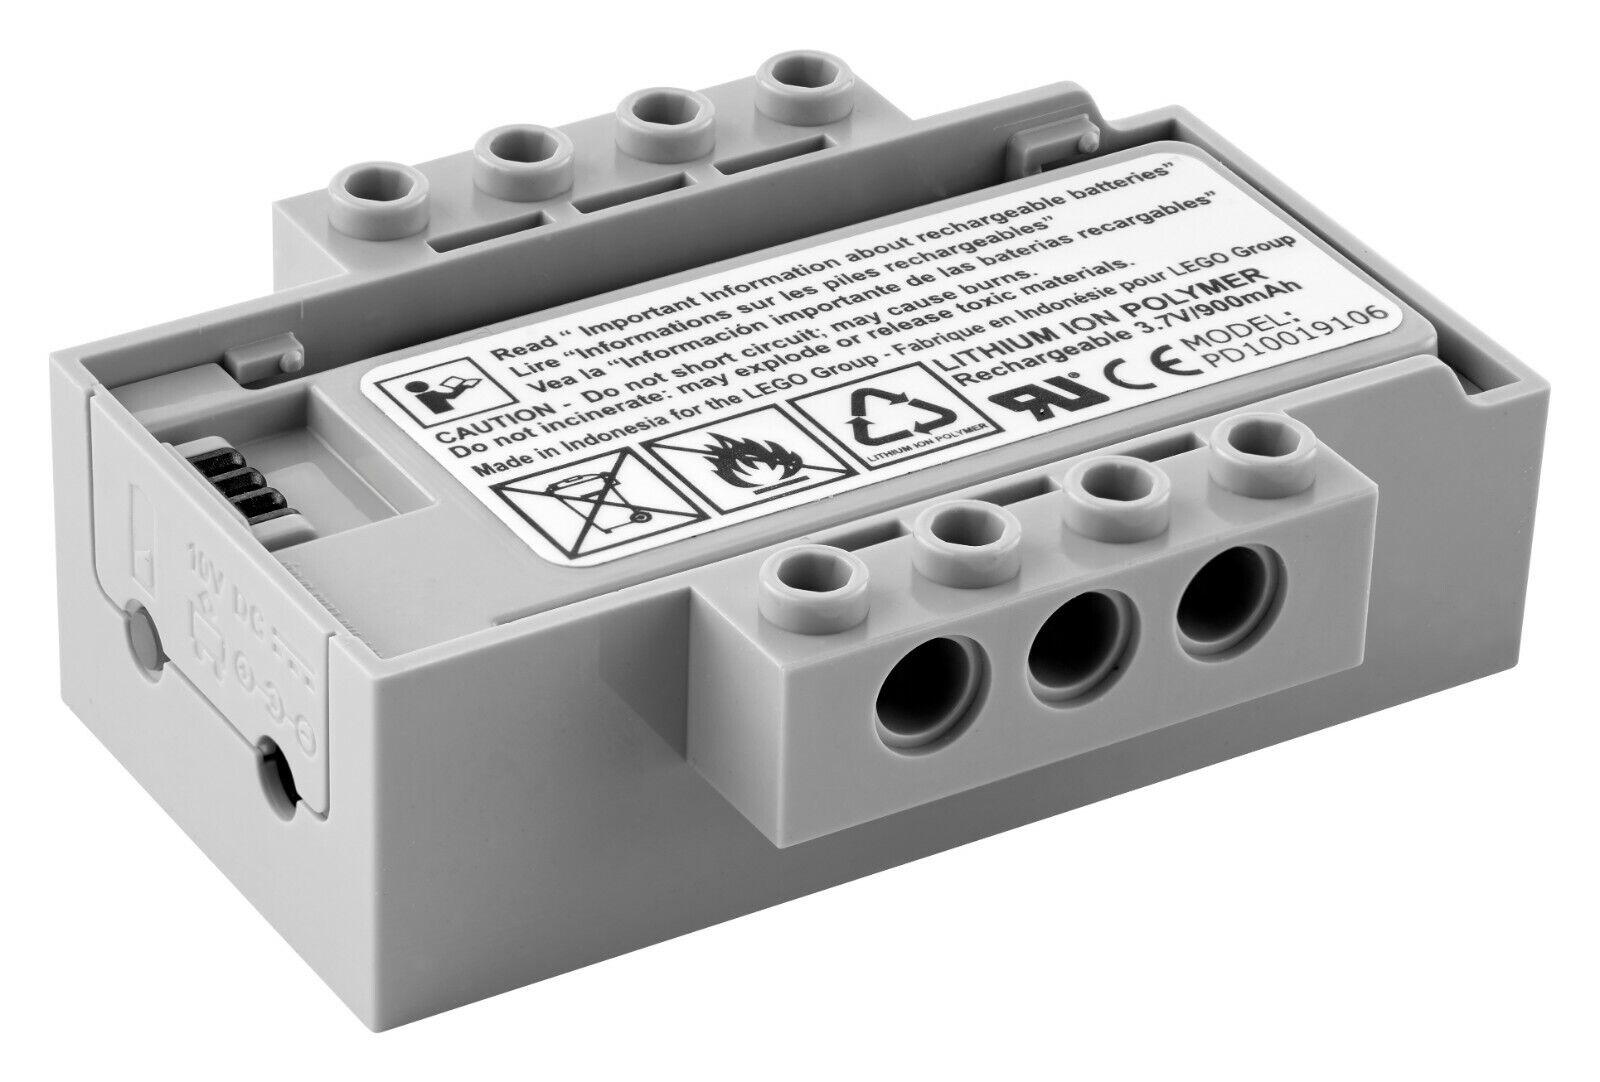 LEGO Education 45302 WeDo  2.0 Smart Hub Rechargeable Battery  online economico